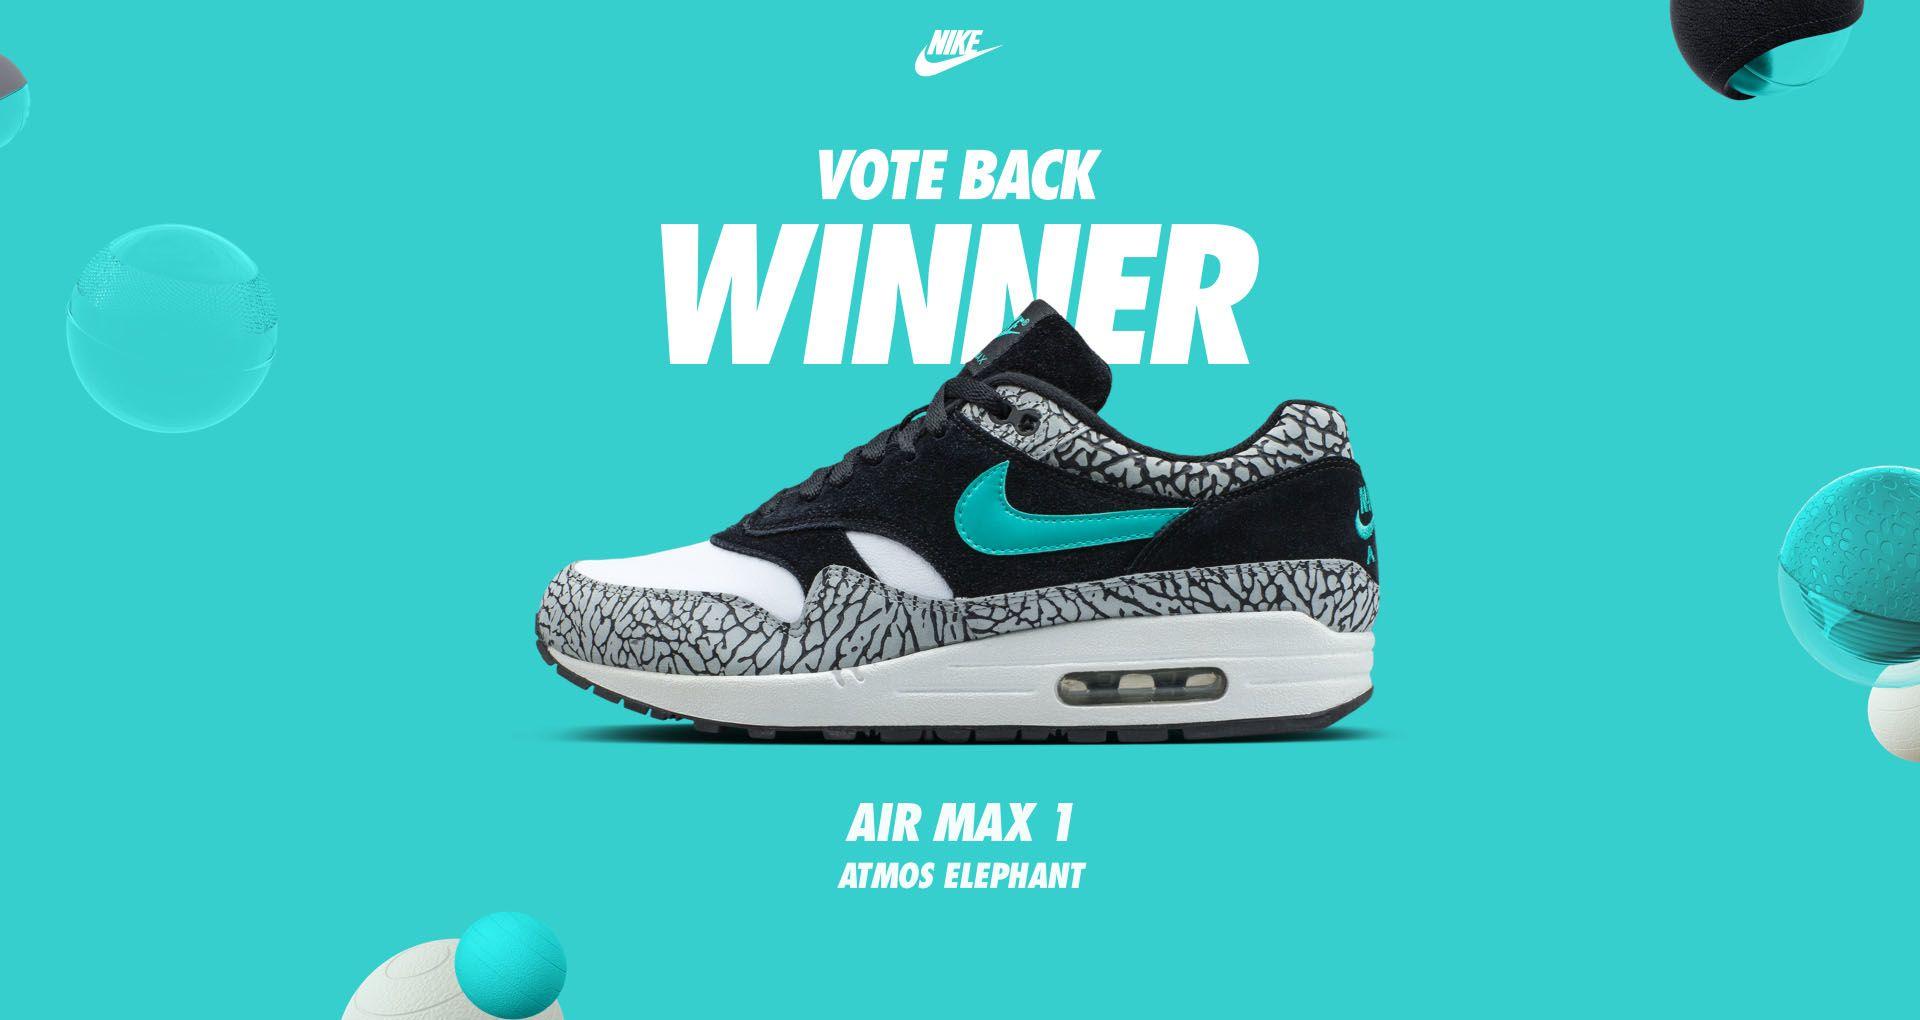 newest f0321 5ba61 AIR MAX. VOTE BACK WINNER